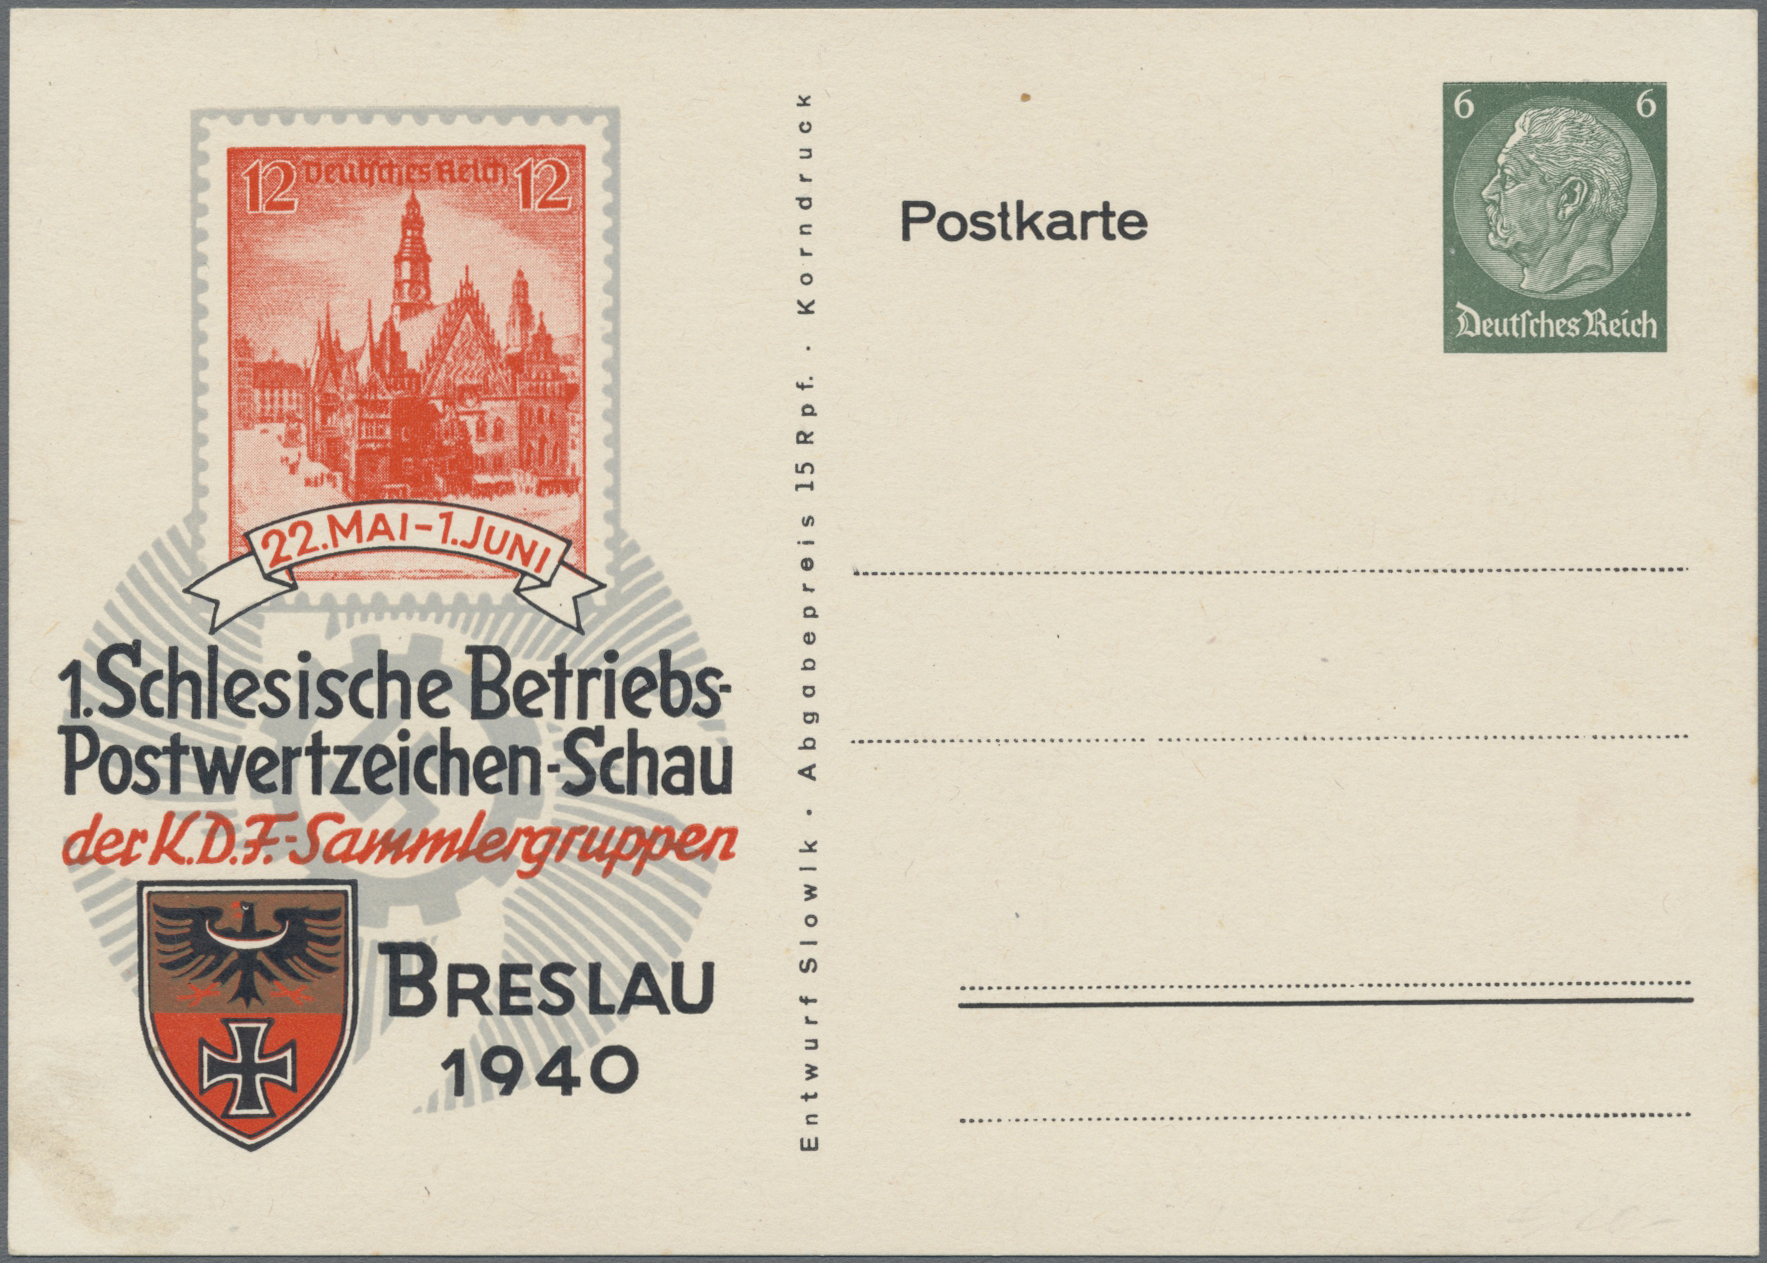 Lot 23552 - Deutsches Reich - Privatganzsachen  -  Auktionshaus Christoph Gärtner GmbH & Co. KG Sale #49 Collections Overseas, Thematics, Europe, Germany/Estates